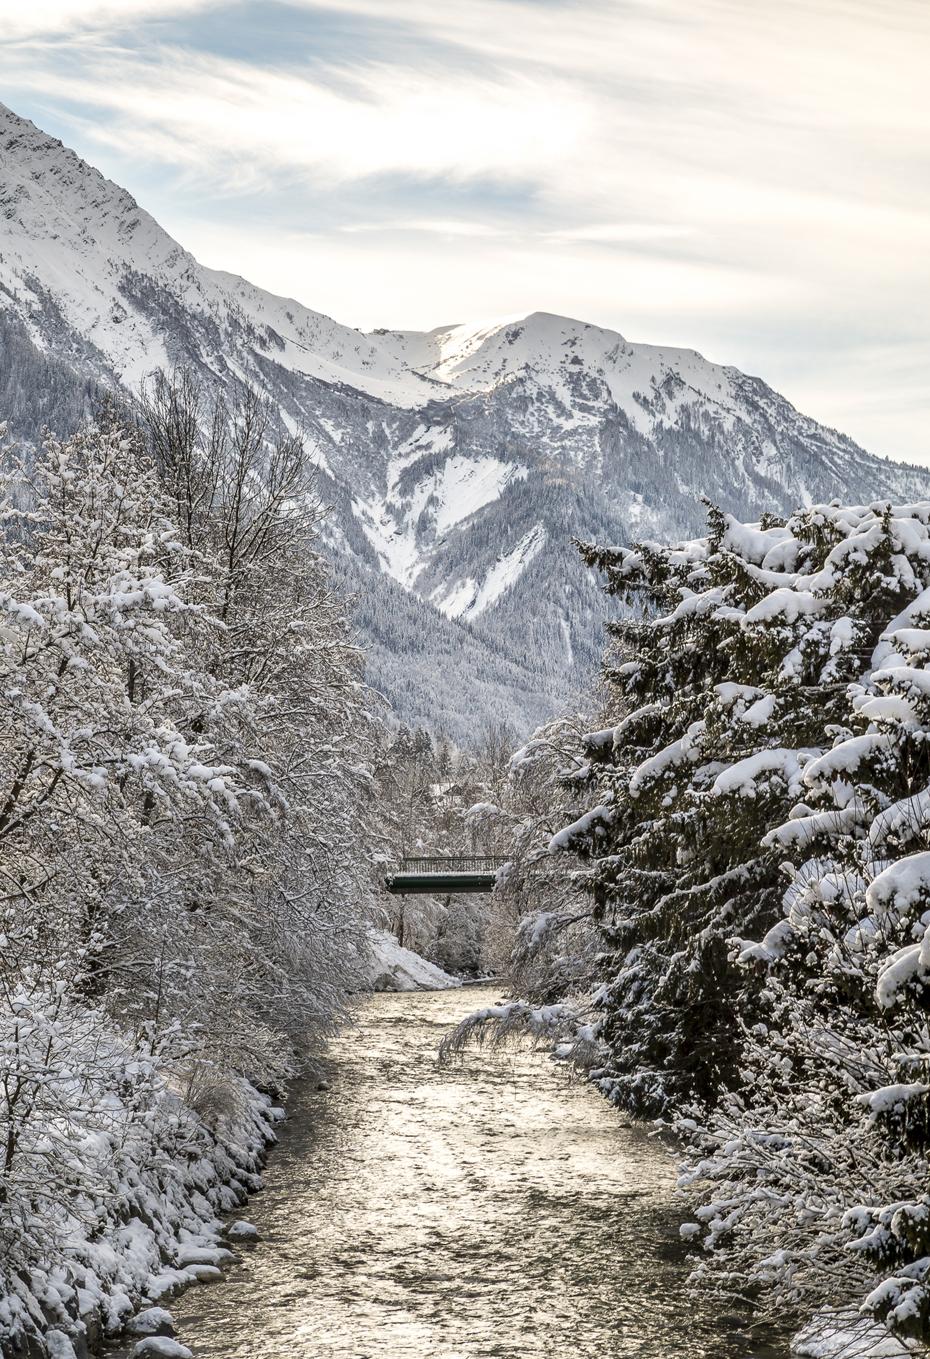 Arve-Chamonix